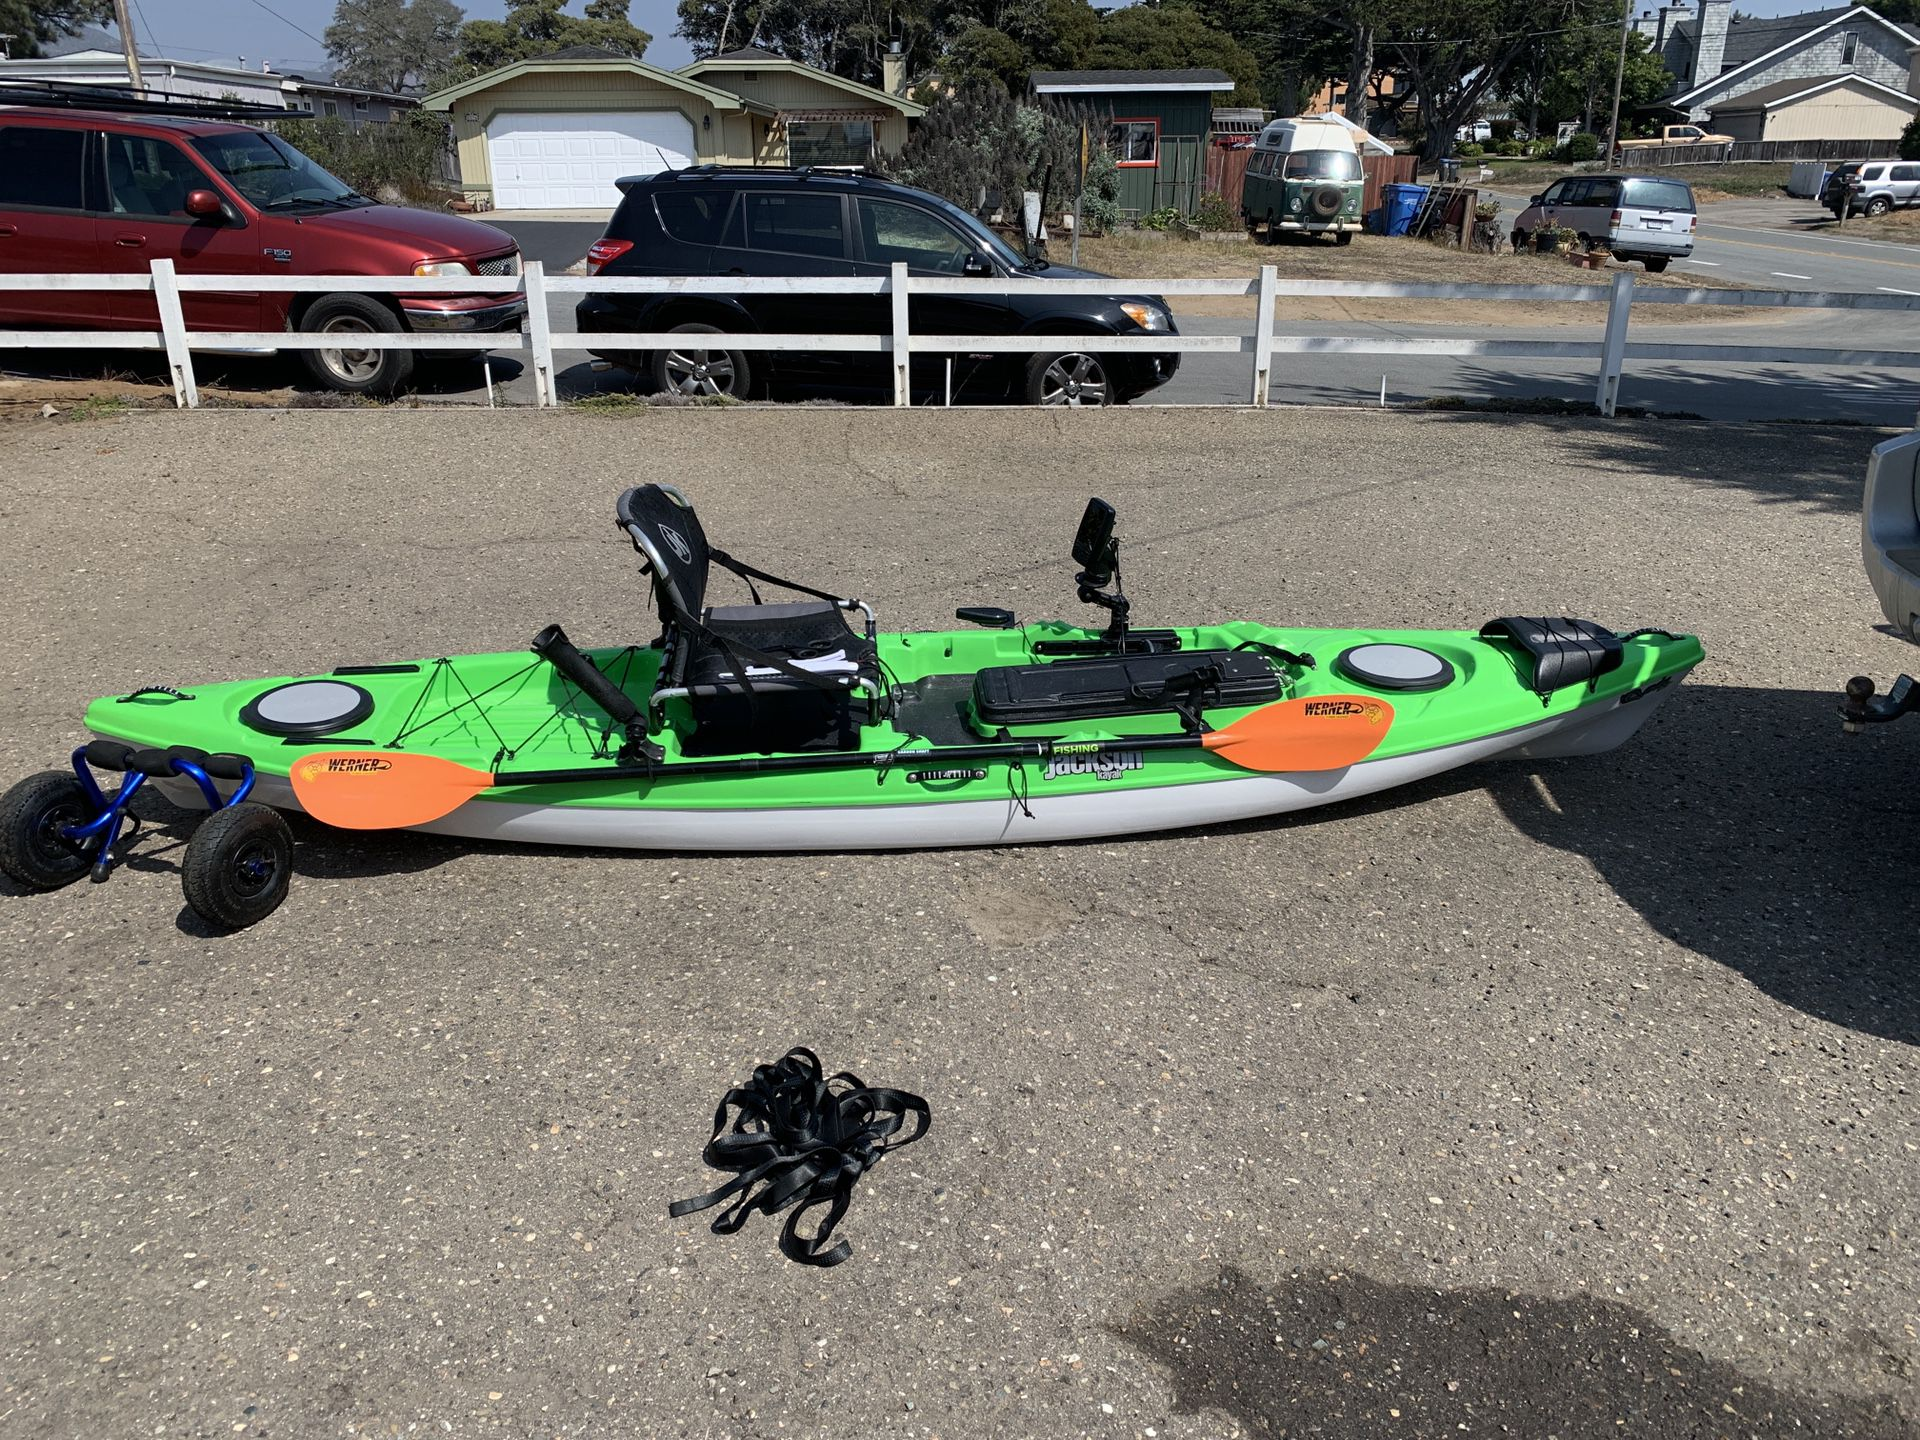 Photo Kayak, 12 6 Jackson Kayaks Cuda LT Ocean Kayak with all the fixins